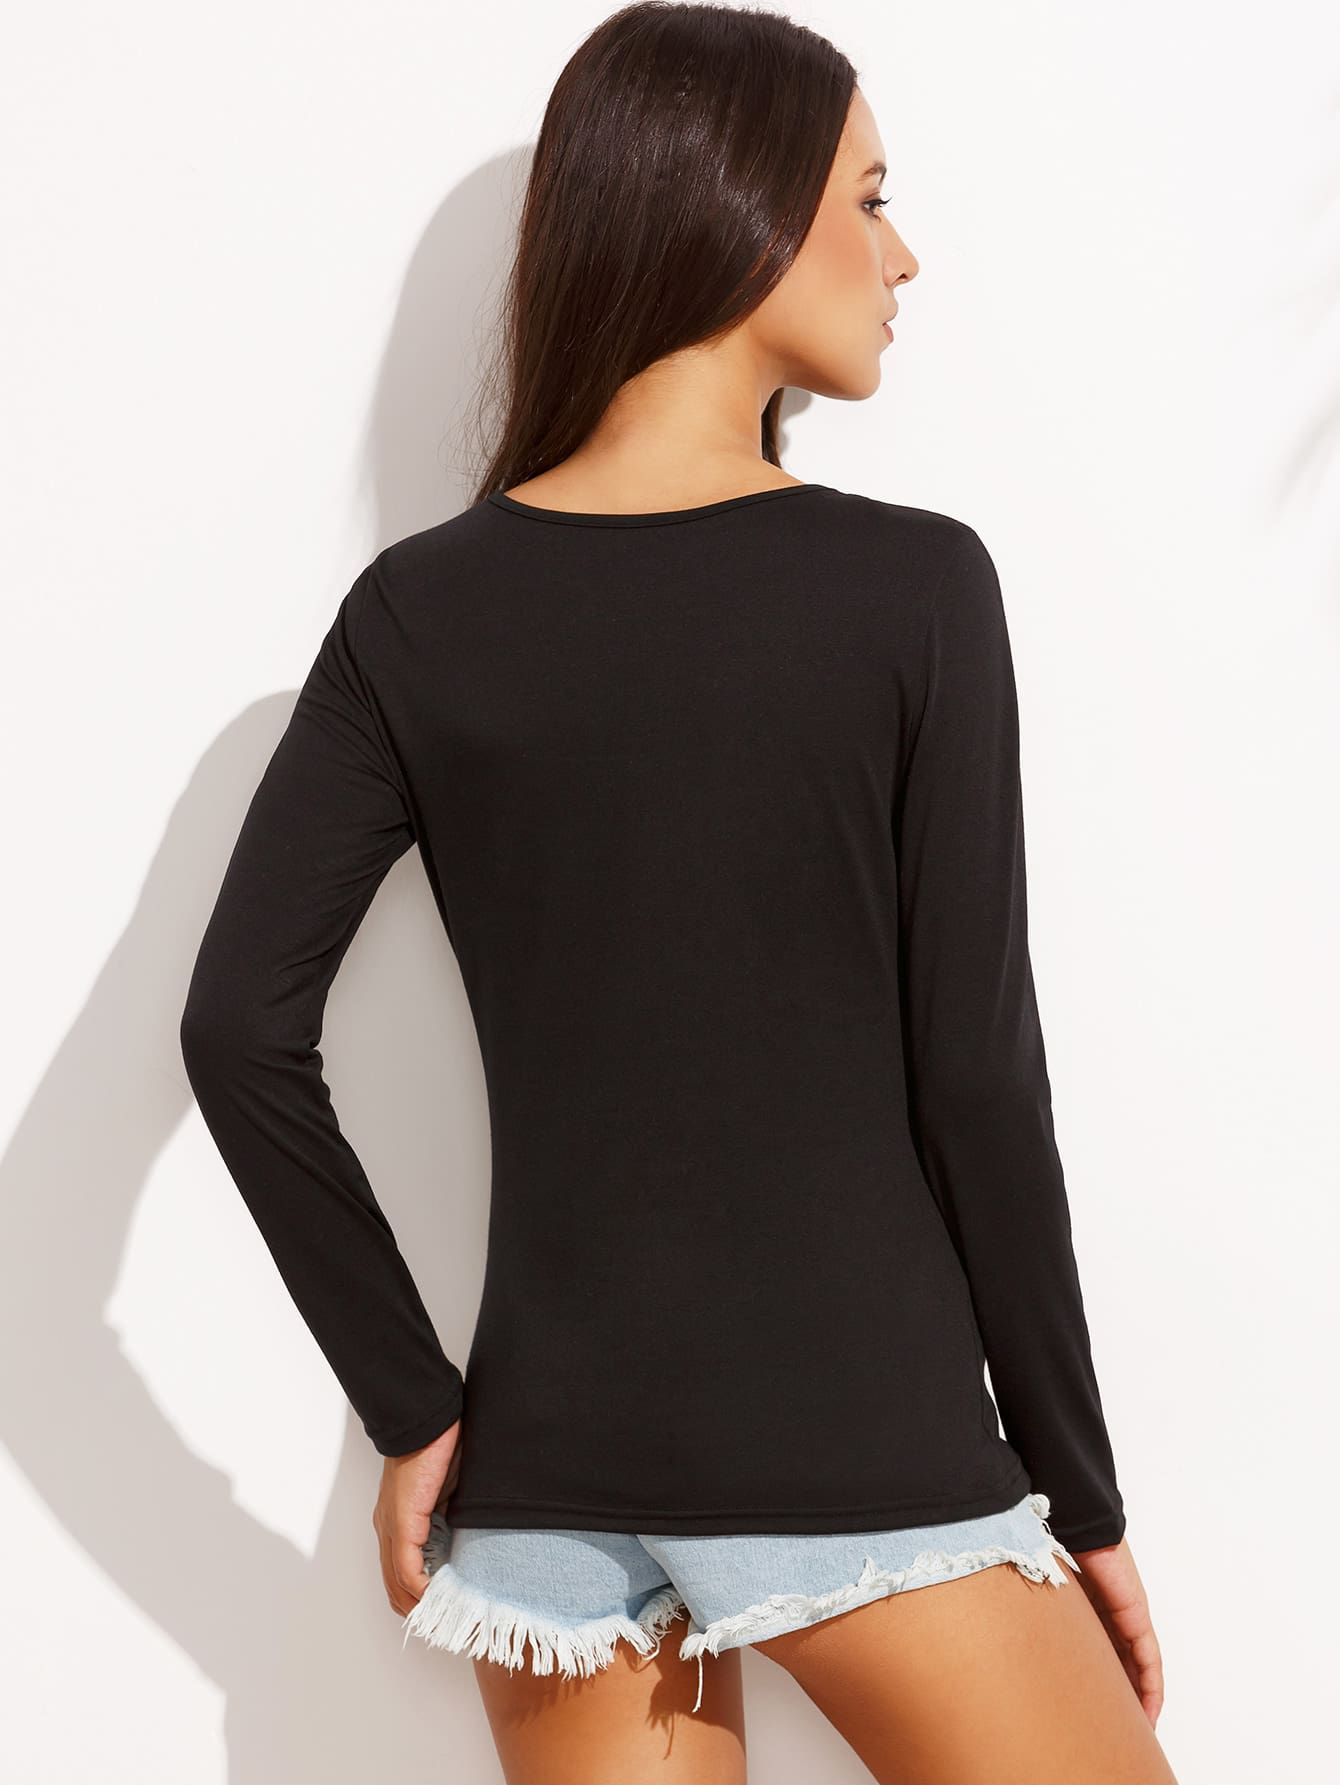 Black Cutout Lattice V Neck T-shirt